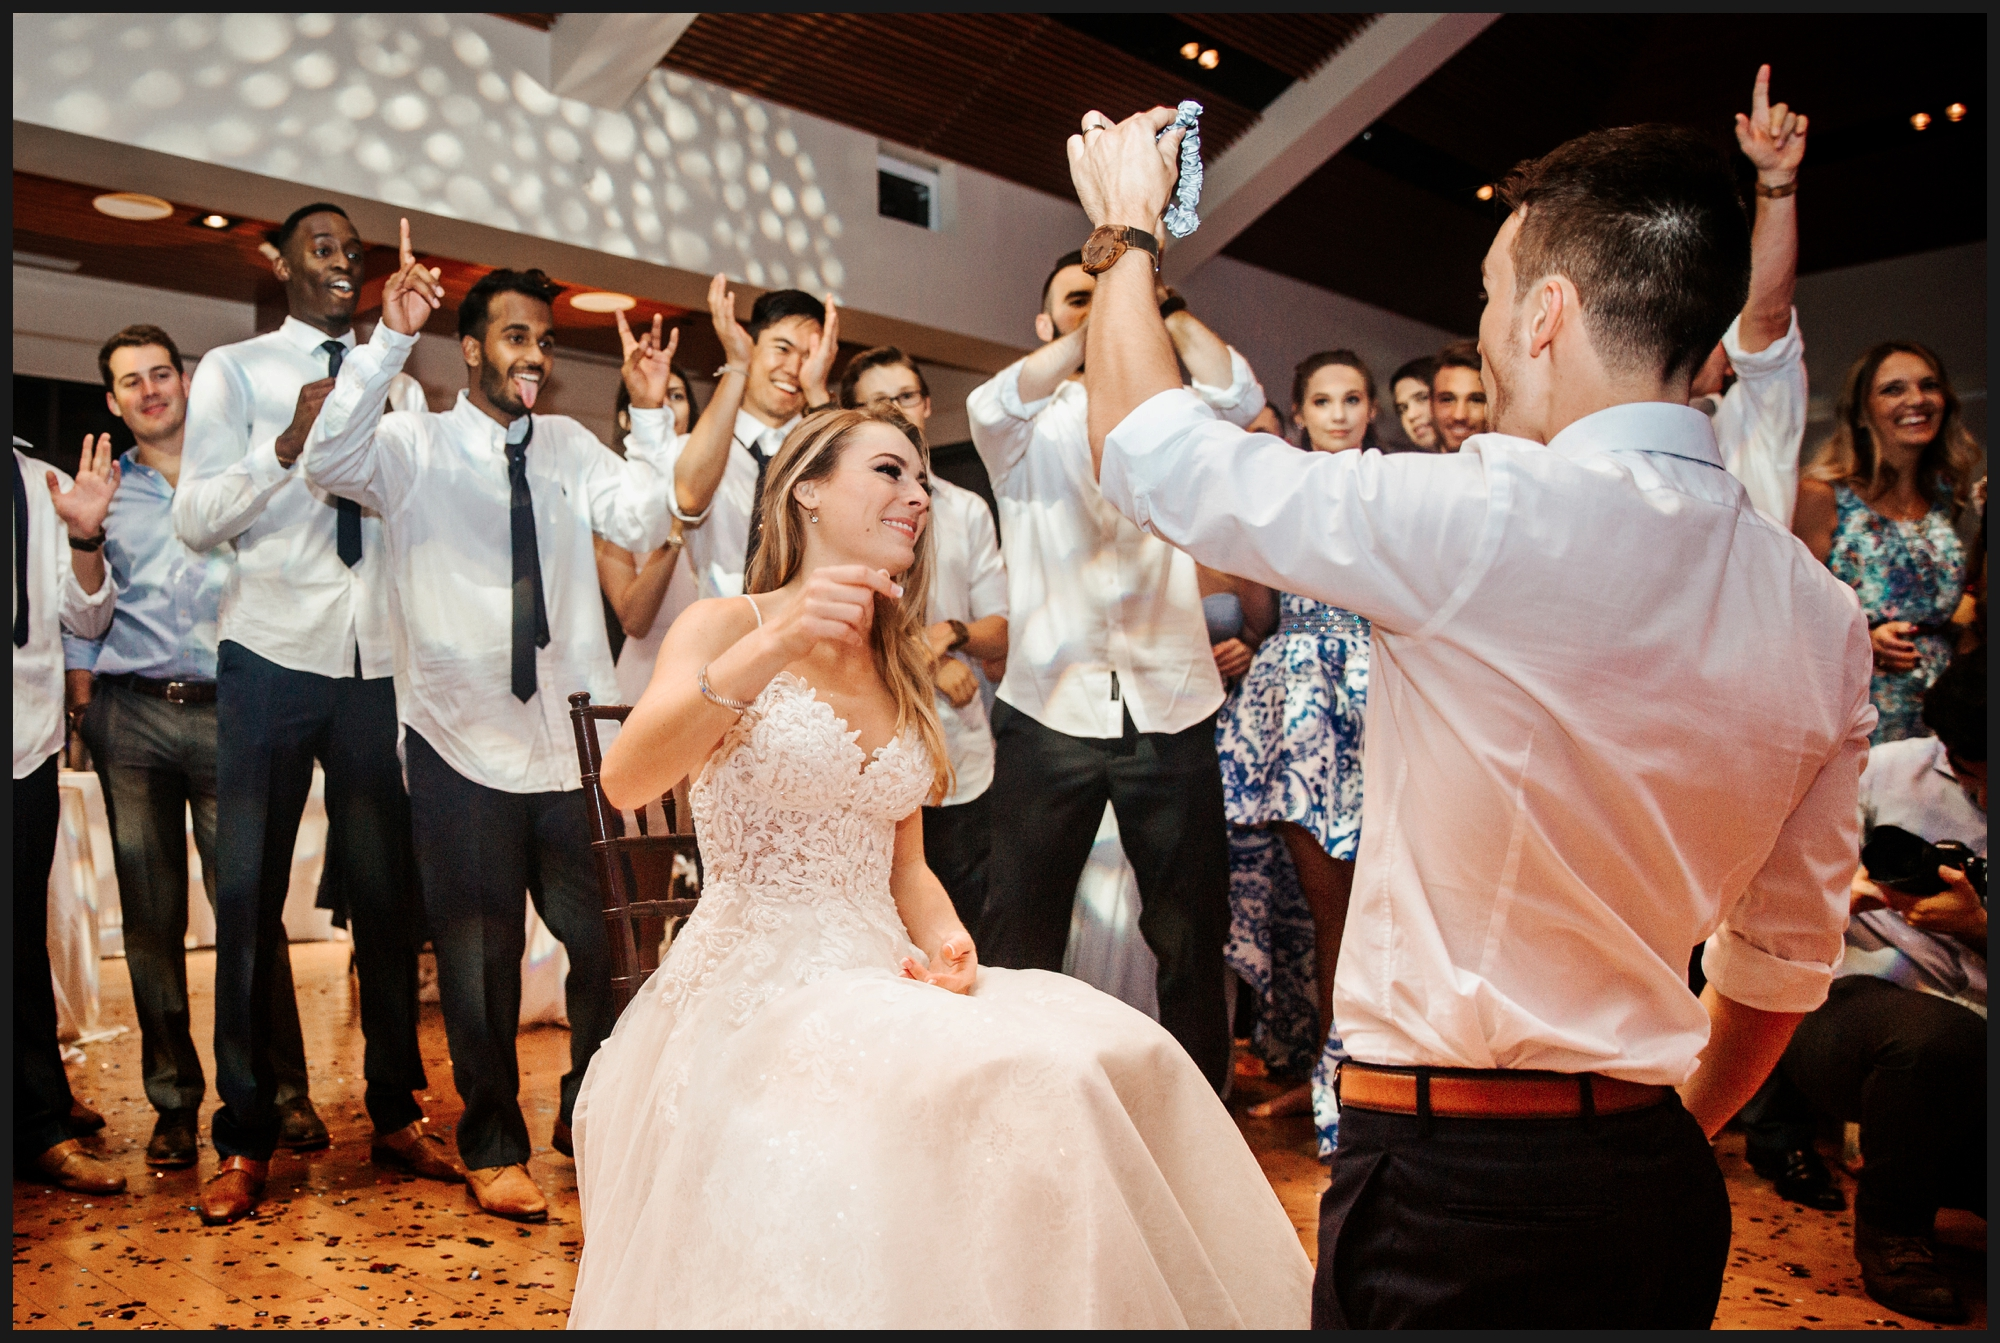 Orlando-Wedding-Photographer-destination-wedding-photographer-florida-wedding-photographer-bohemian-wedding-photographer_0137.jpg